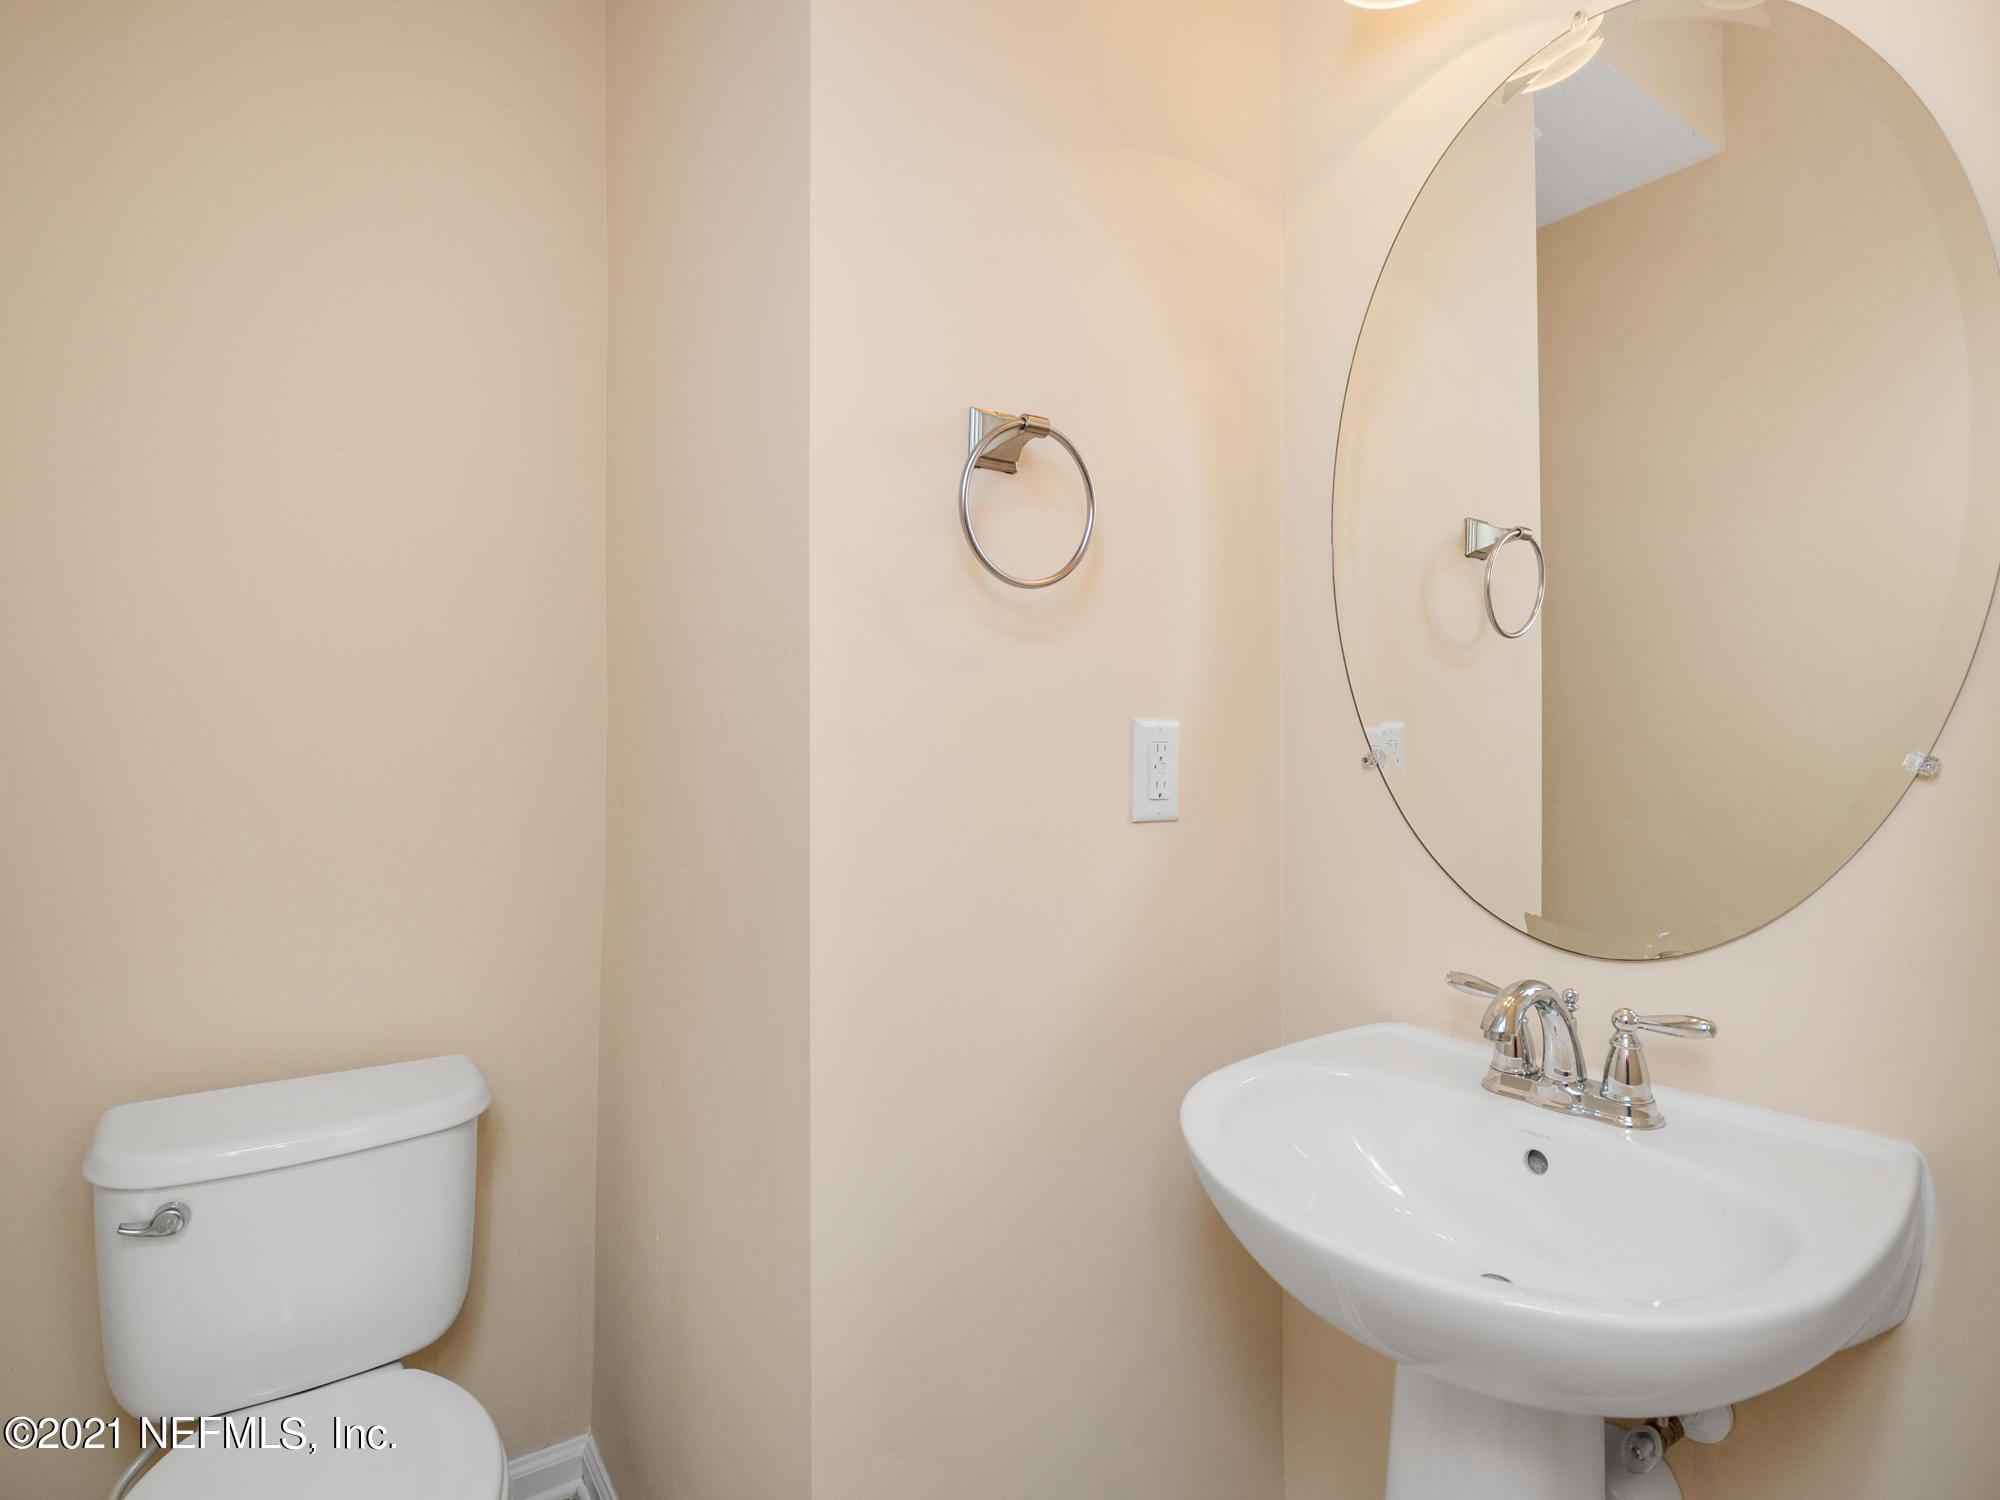 3839 AUBREY, ORANGE PARK, FLORIDA 32065, 3 Bedrooms Bedrooms, ,2 BathroomsBathrooms,Residential,For sale,AUBREY,1089681